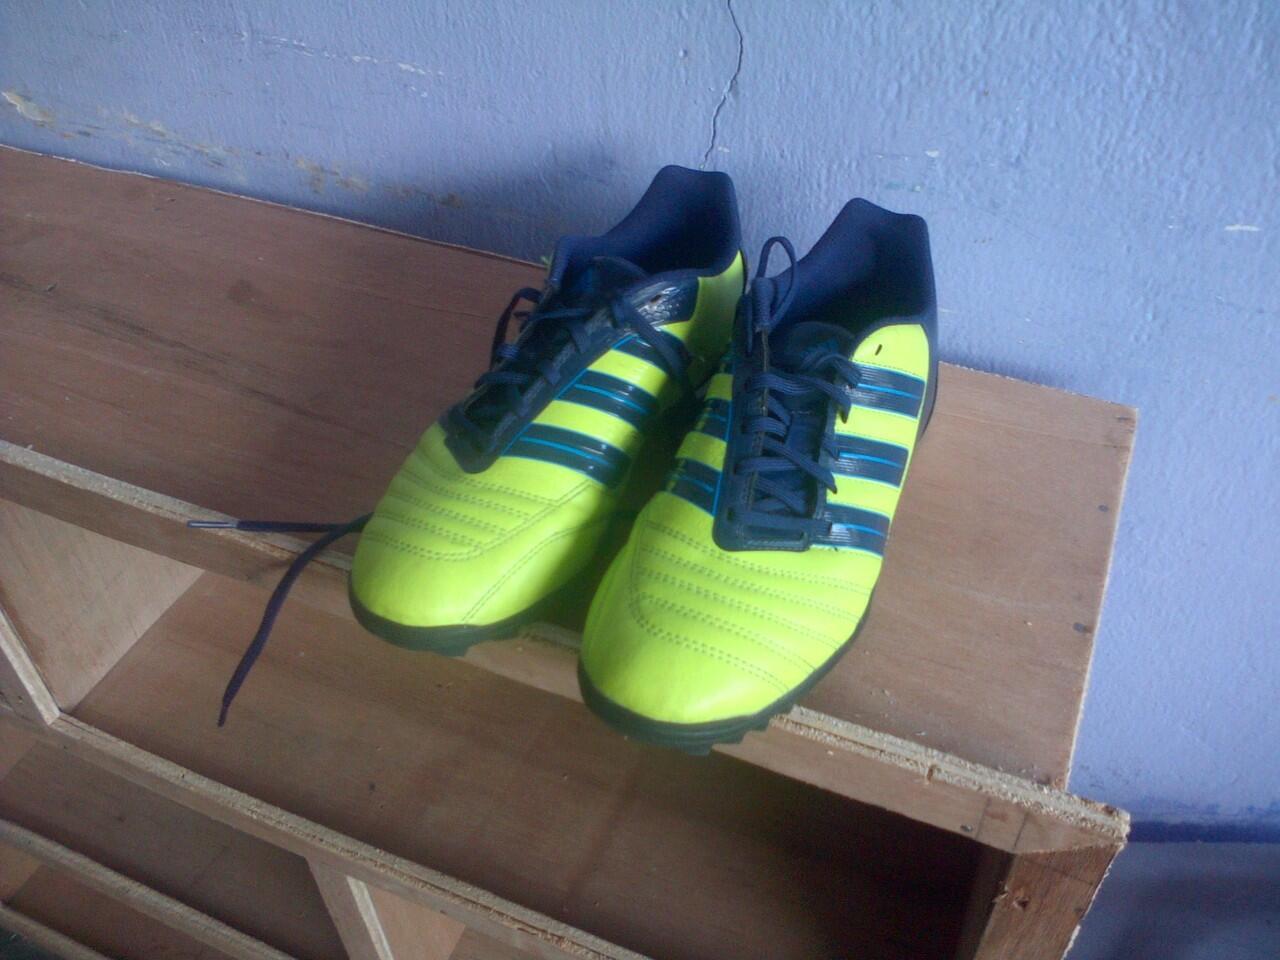 online store 4c0f1 542e2 coupon code for jual sepatu futsal adidas predator rvp ori 2nd f0dff 71350